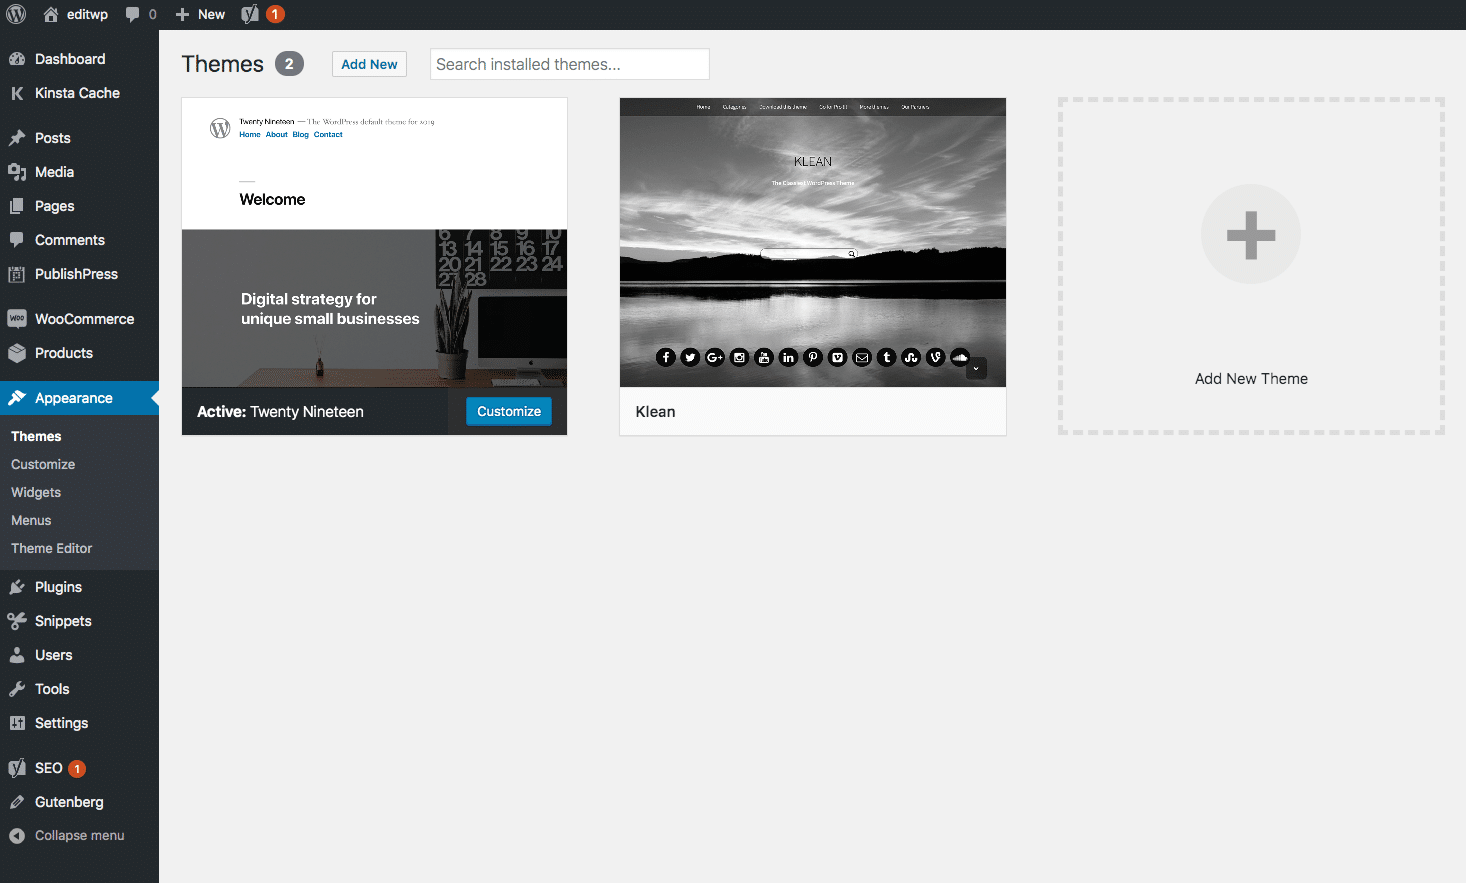 Thème actuel dans WordPress